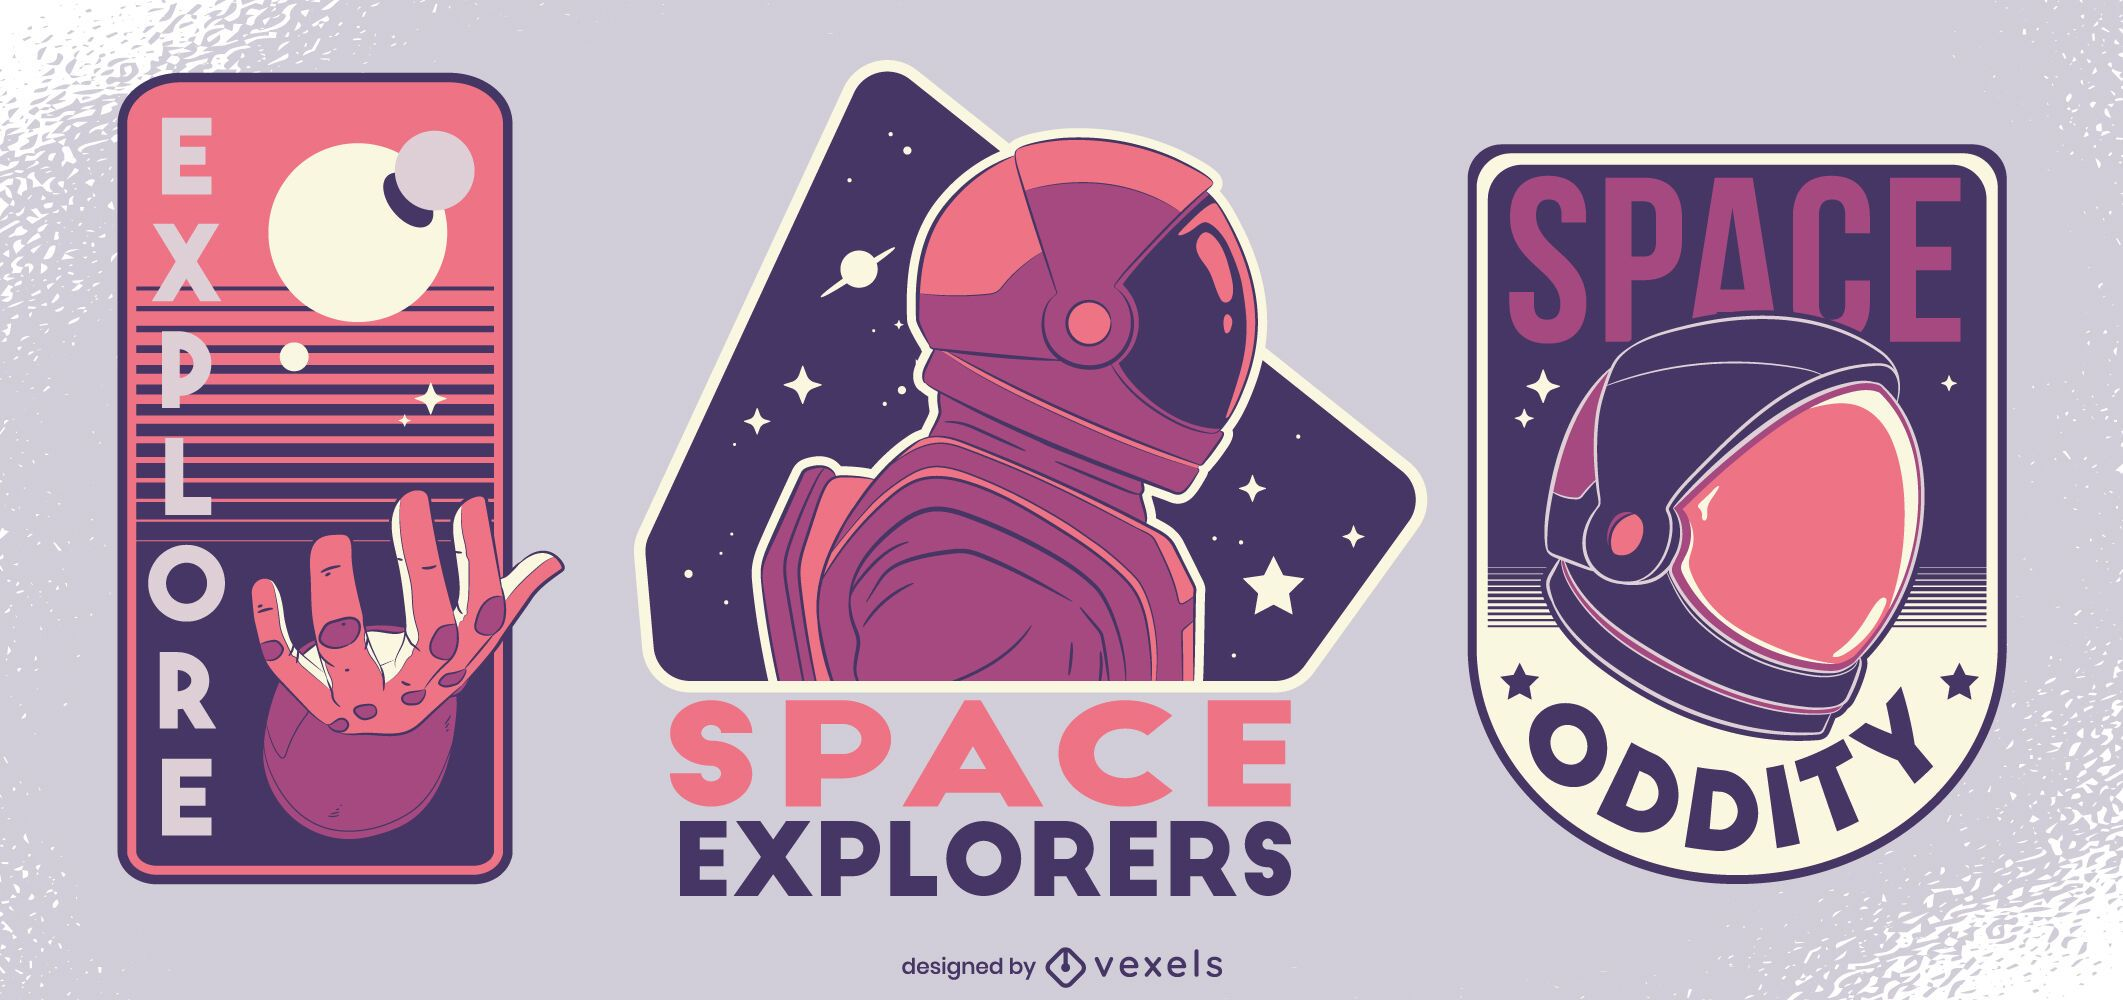 Space explorers badge design set